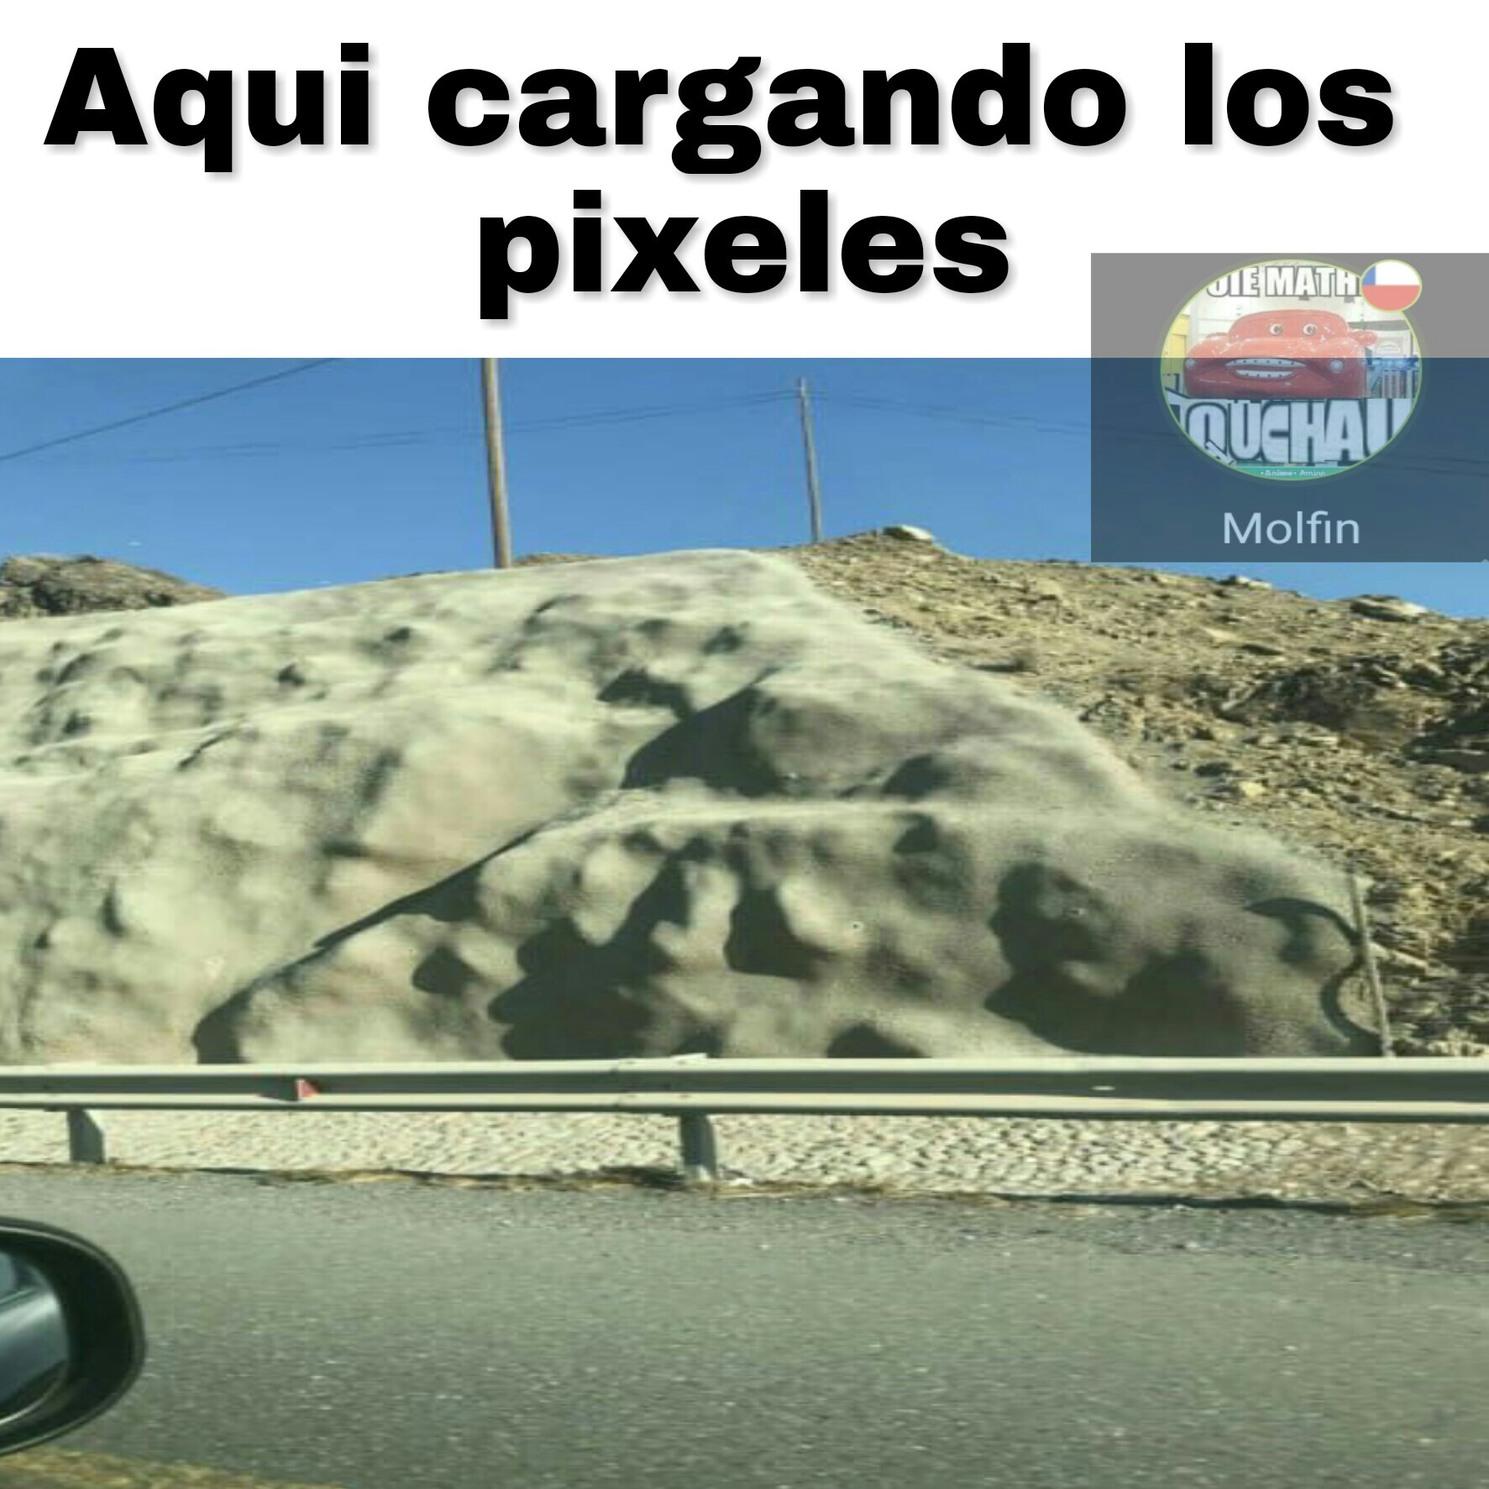 Cargando pixeles - meme